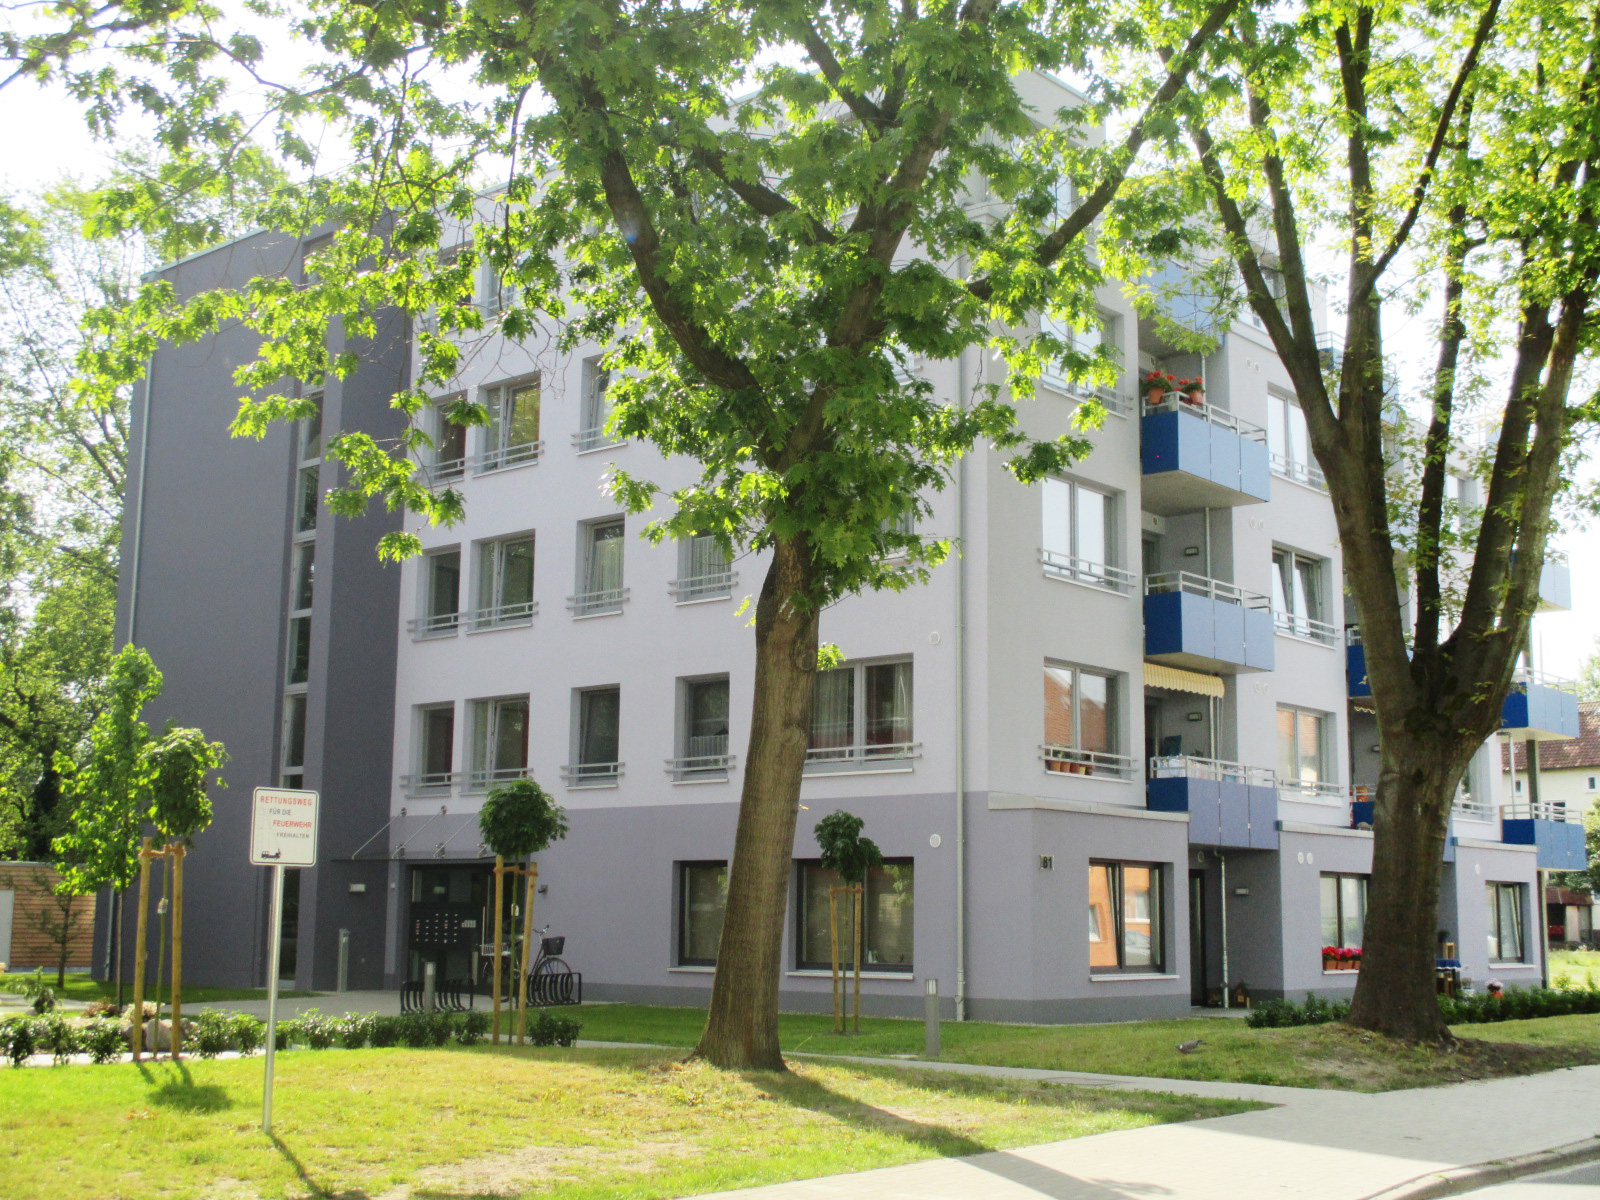 GSG - Wohnungsgesellschaft Delmenhorst mbH